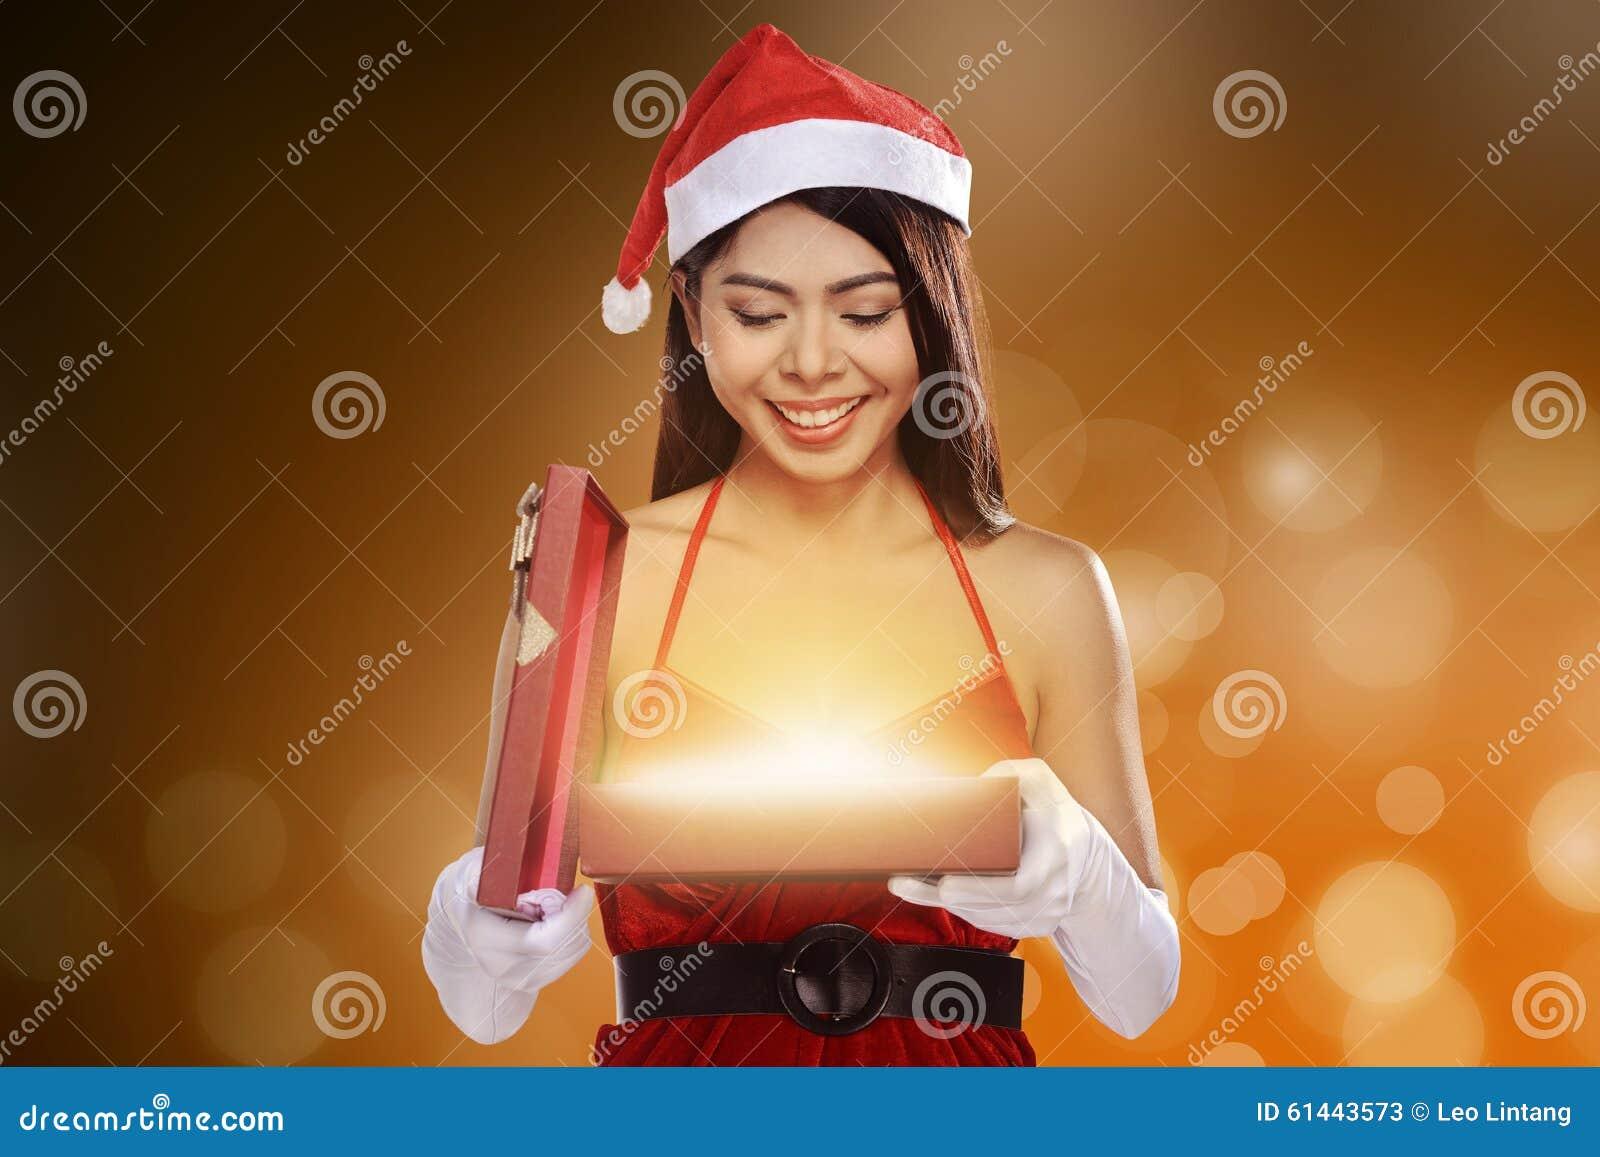 Christmas Santa Woman Opening Gift Box Stock Image - Image ...